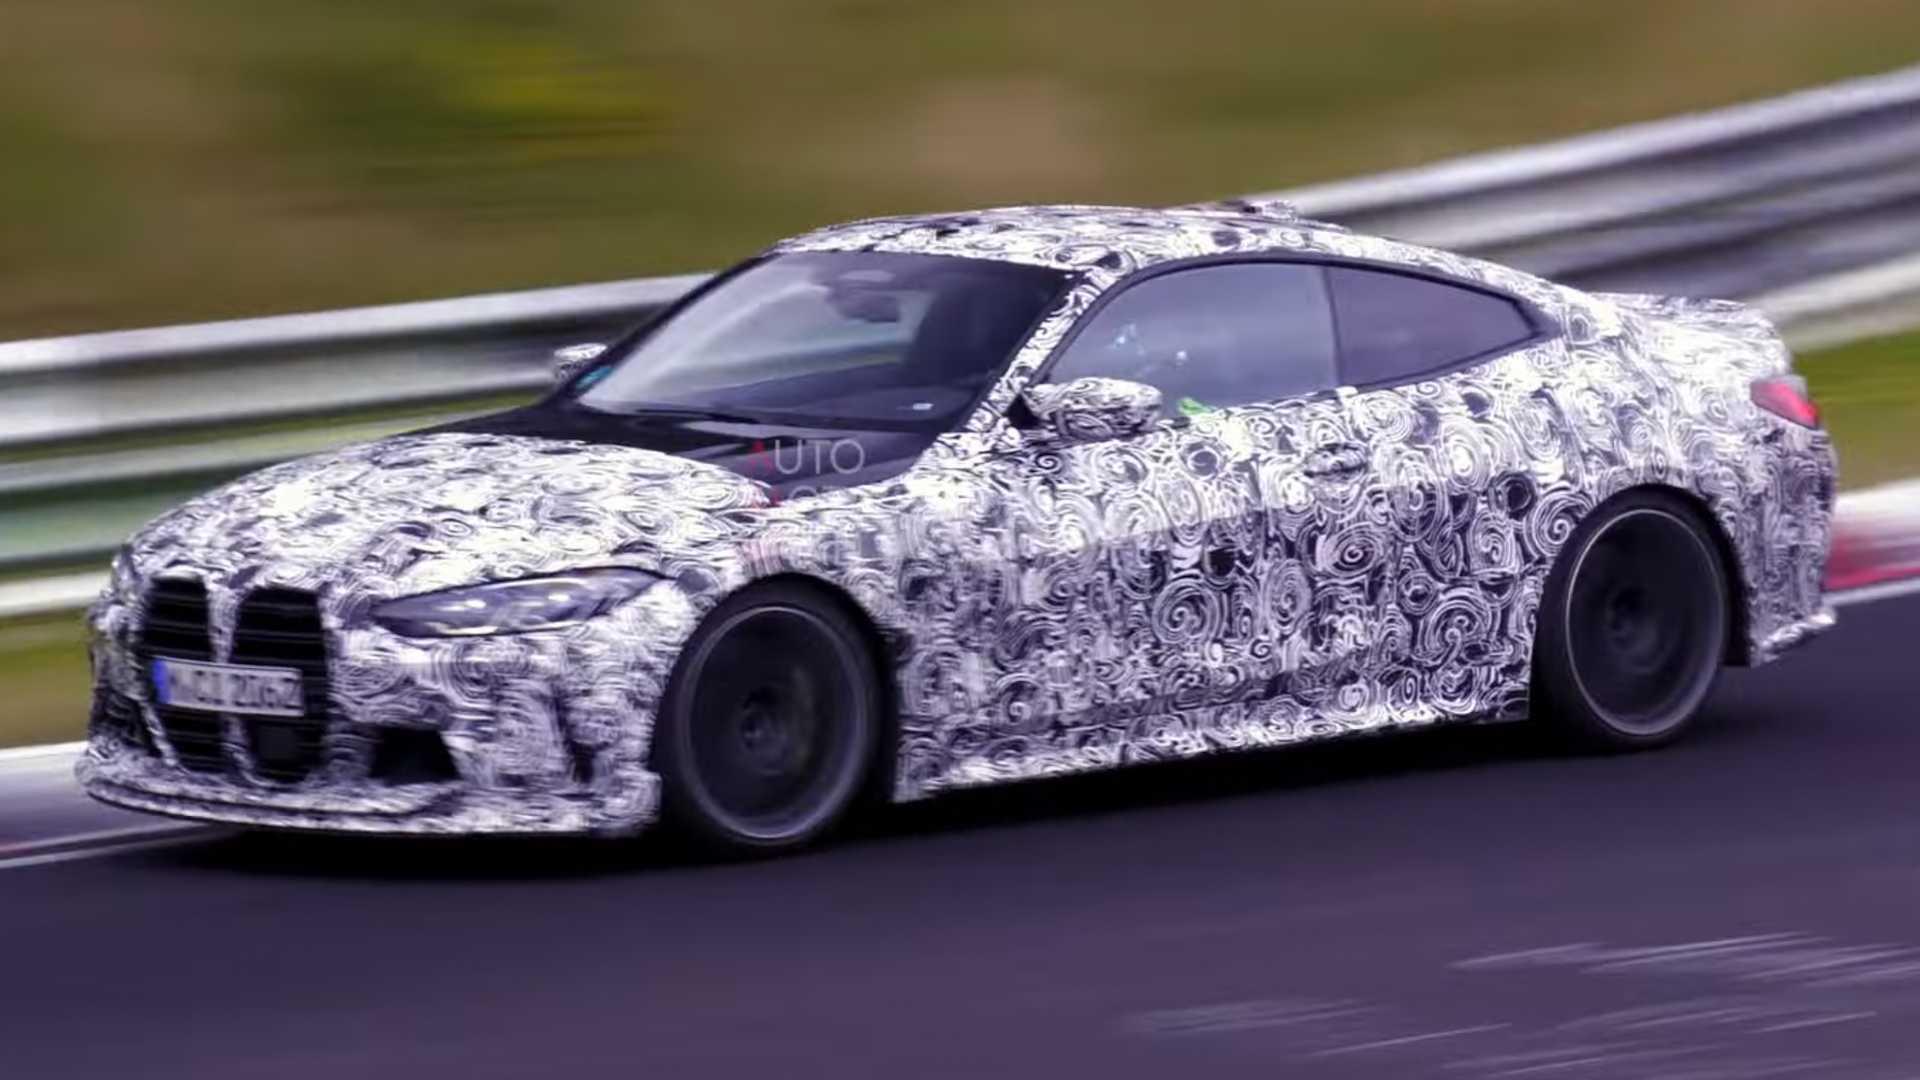 New BMW M4 CSL Sounds Menacing In Nurburgring Spy Video - Motor1